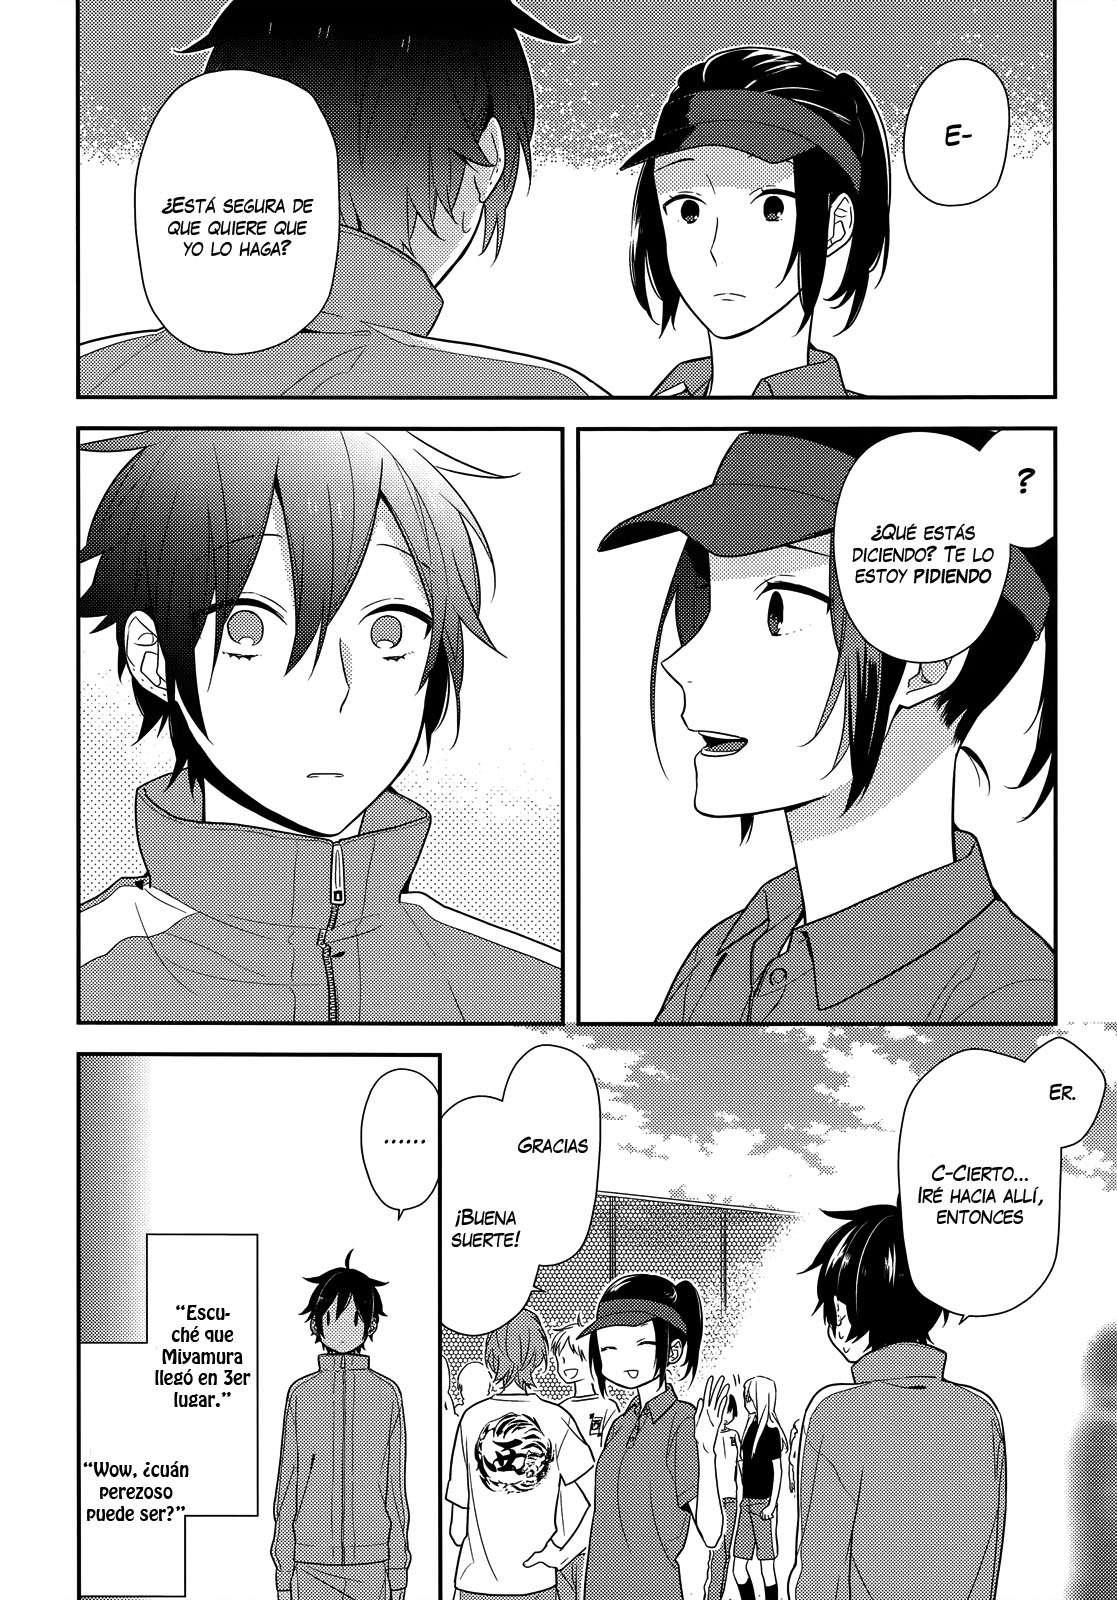 https://c5.ninemanga.com/es_manga/19/1043/383525/9867275dffcde95f6f4ec8ca56a4d53f.jpg Page 11